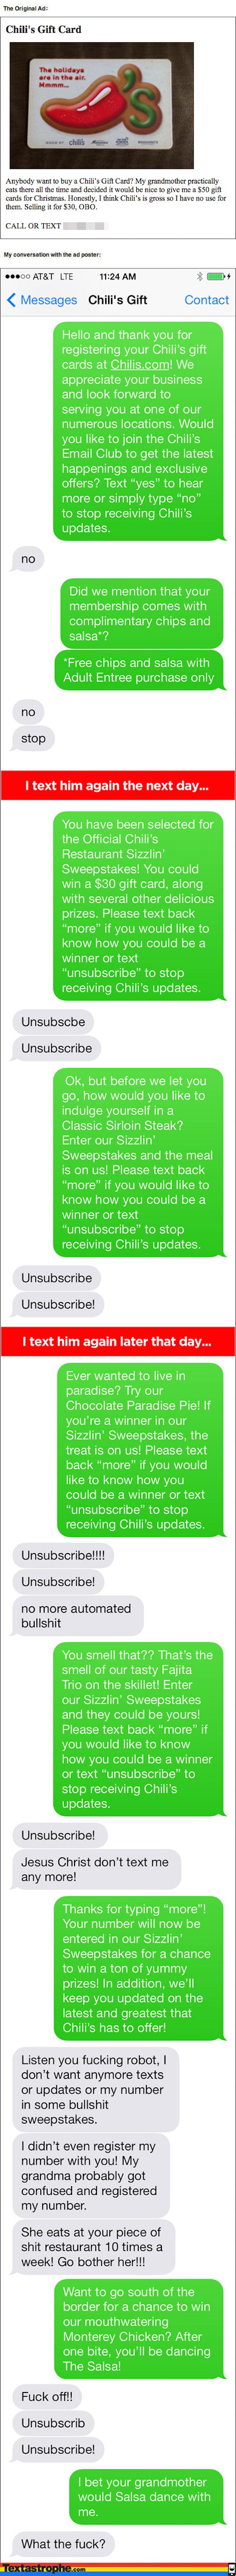 textastrophe pulls off hilarious texting pranks on unsuspecting